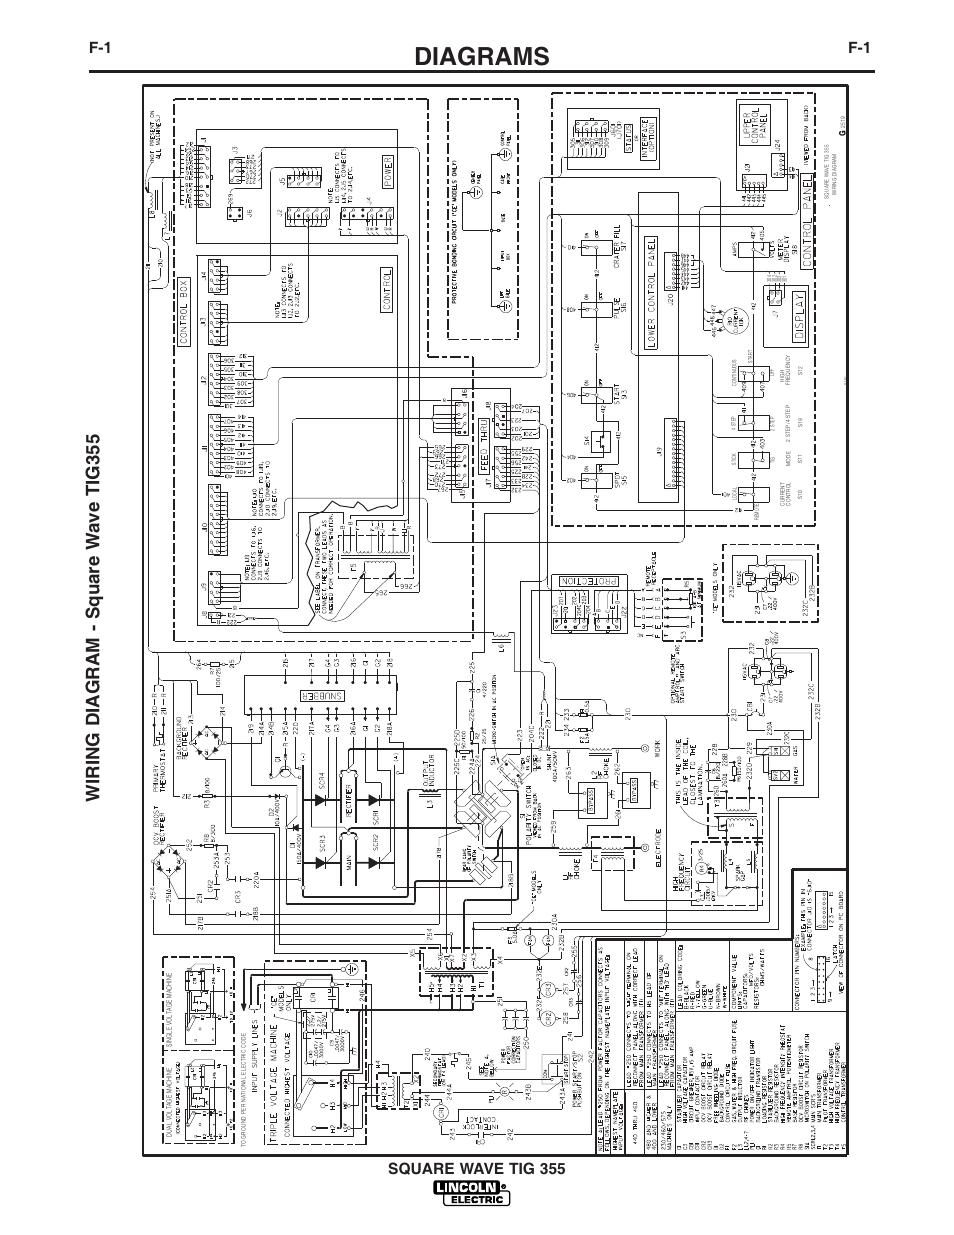 Diagram Es 355 Wiring Diagram Full Version Hd Quality Wiring Diagram Sitexbaehr Videoproiettori3d It